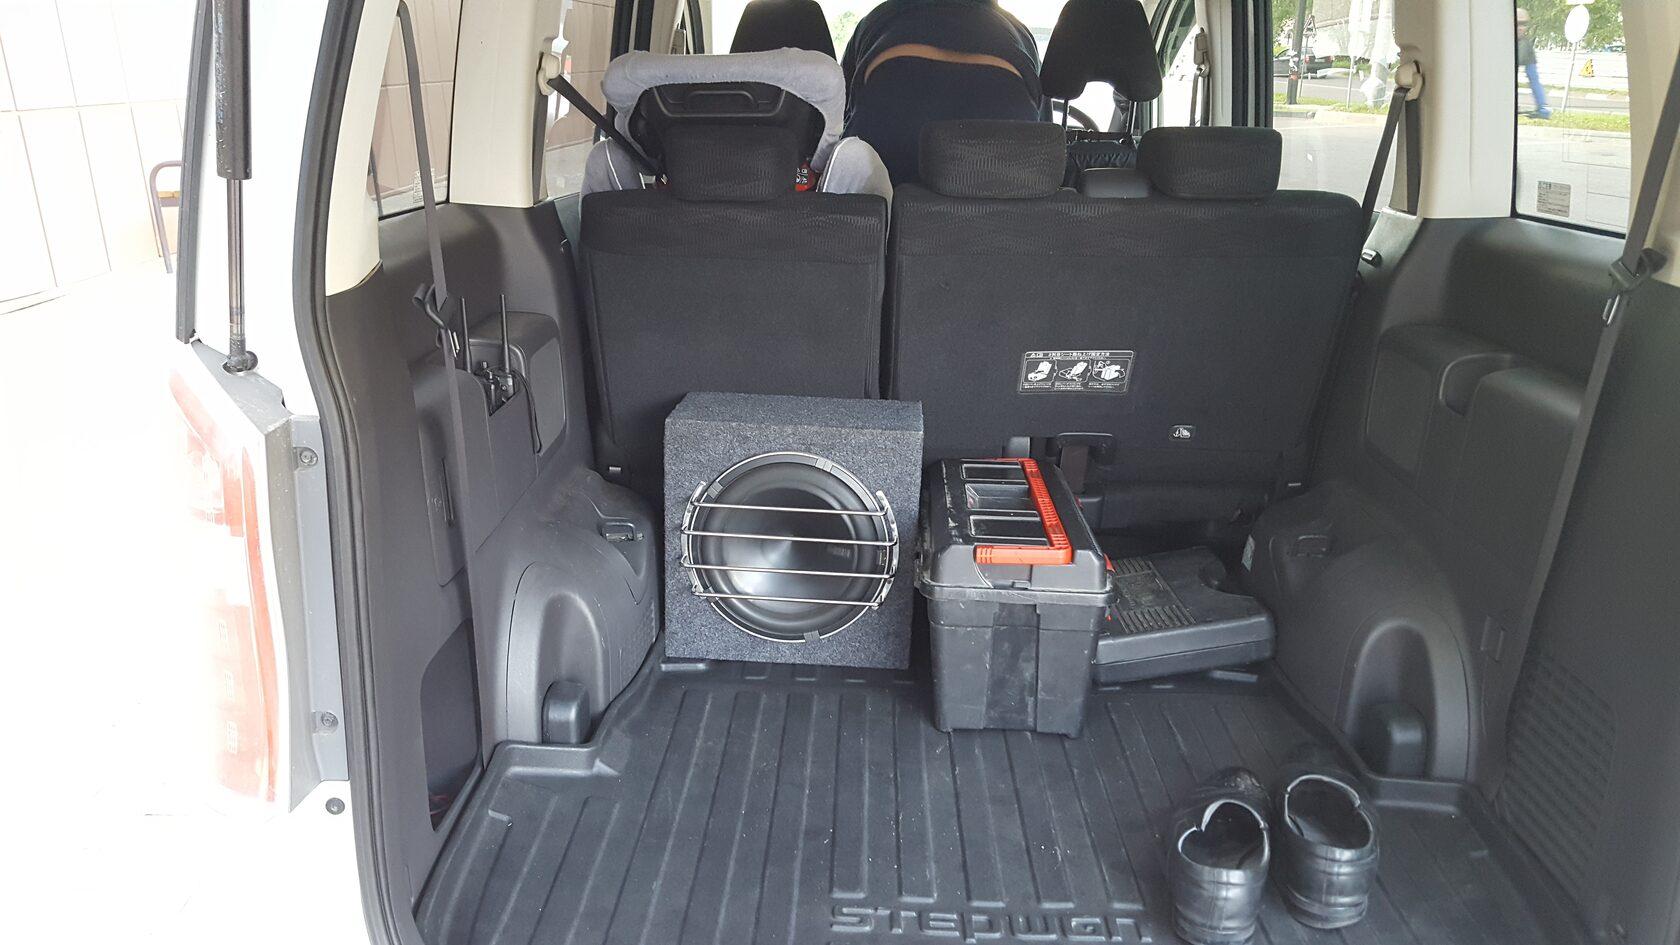 установка сабвуфера в хонда степвагон